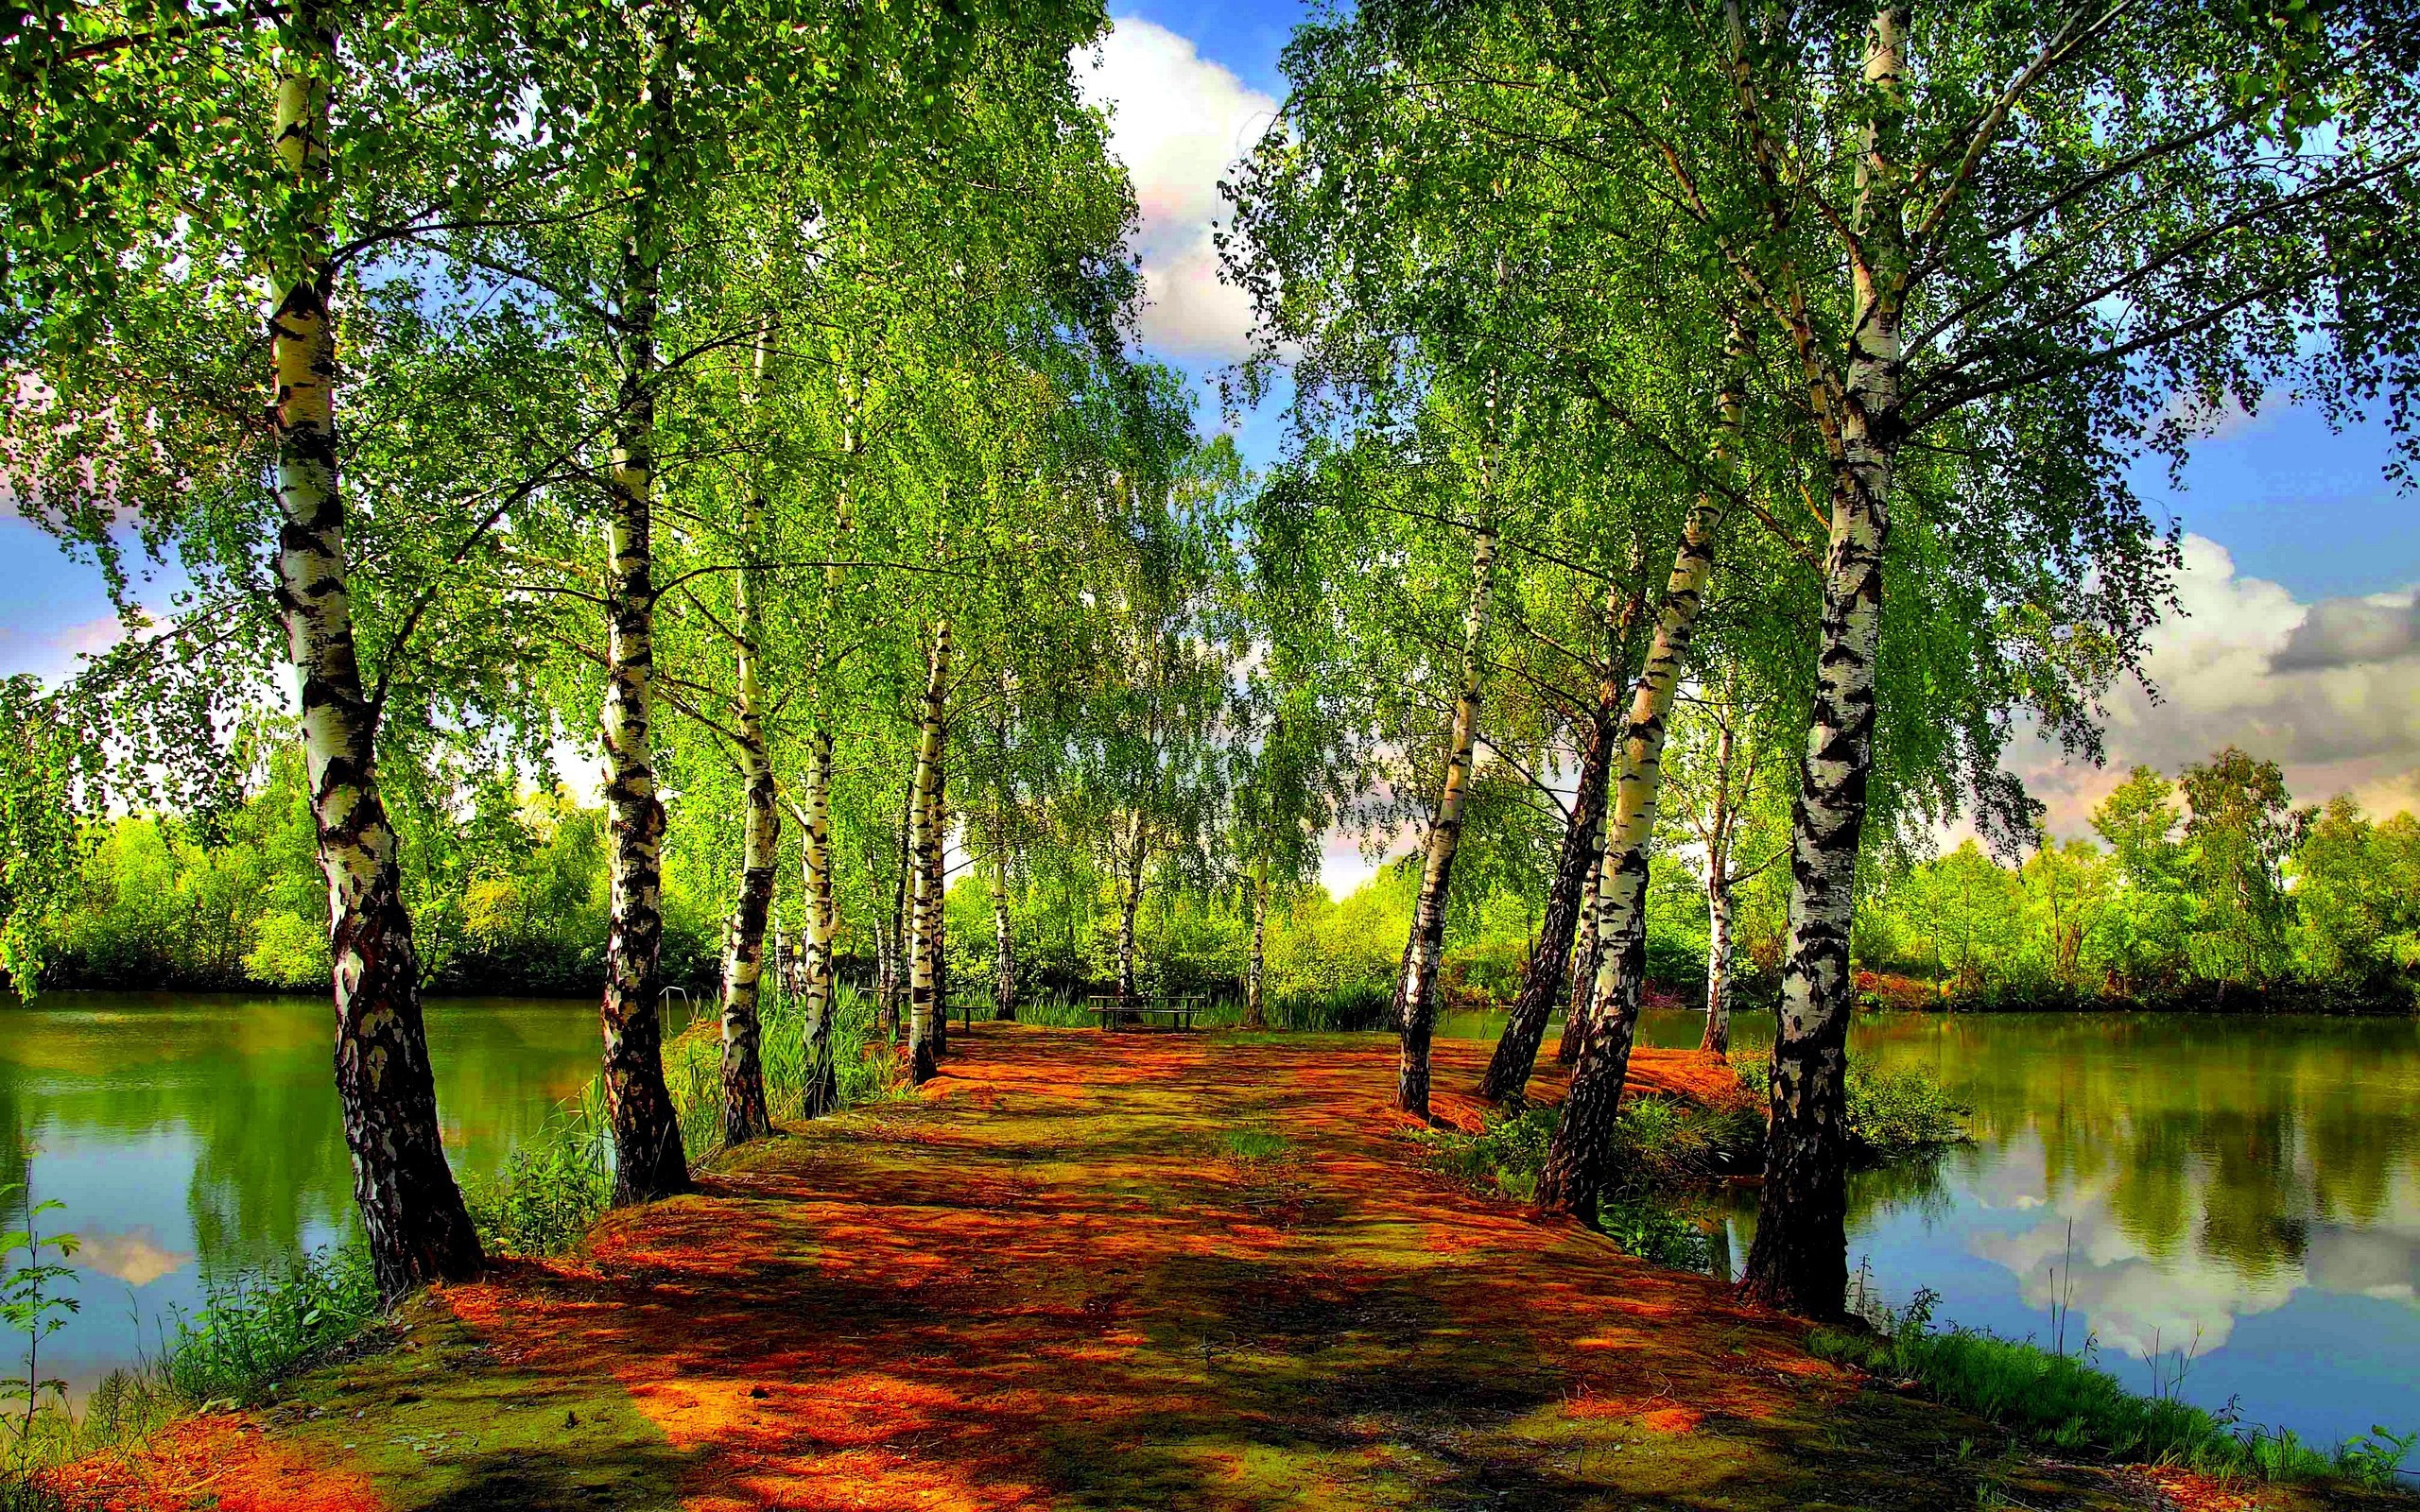 березы дорога зелень лето без смс